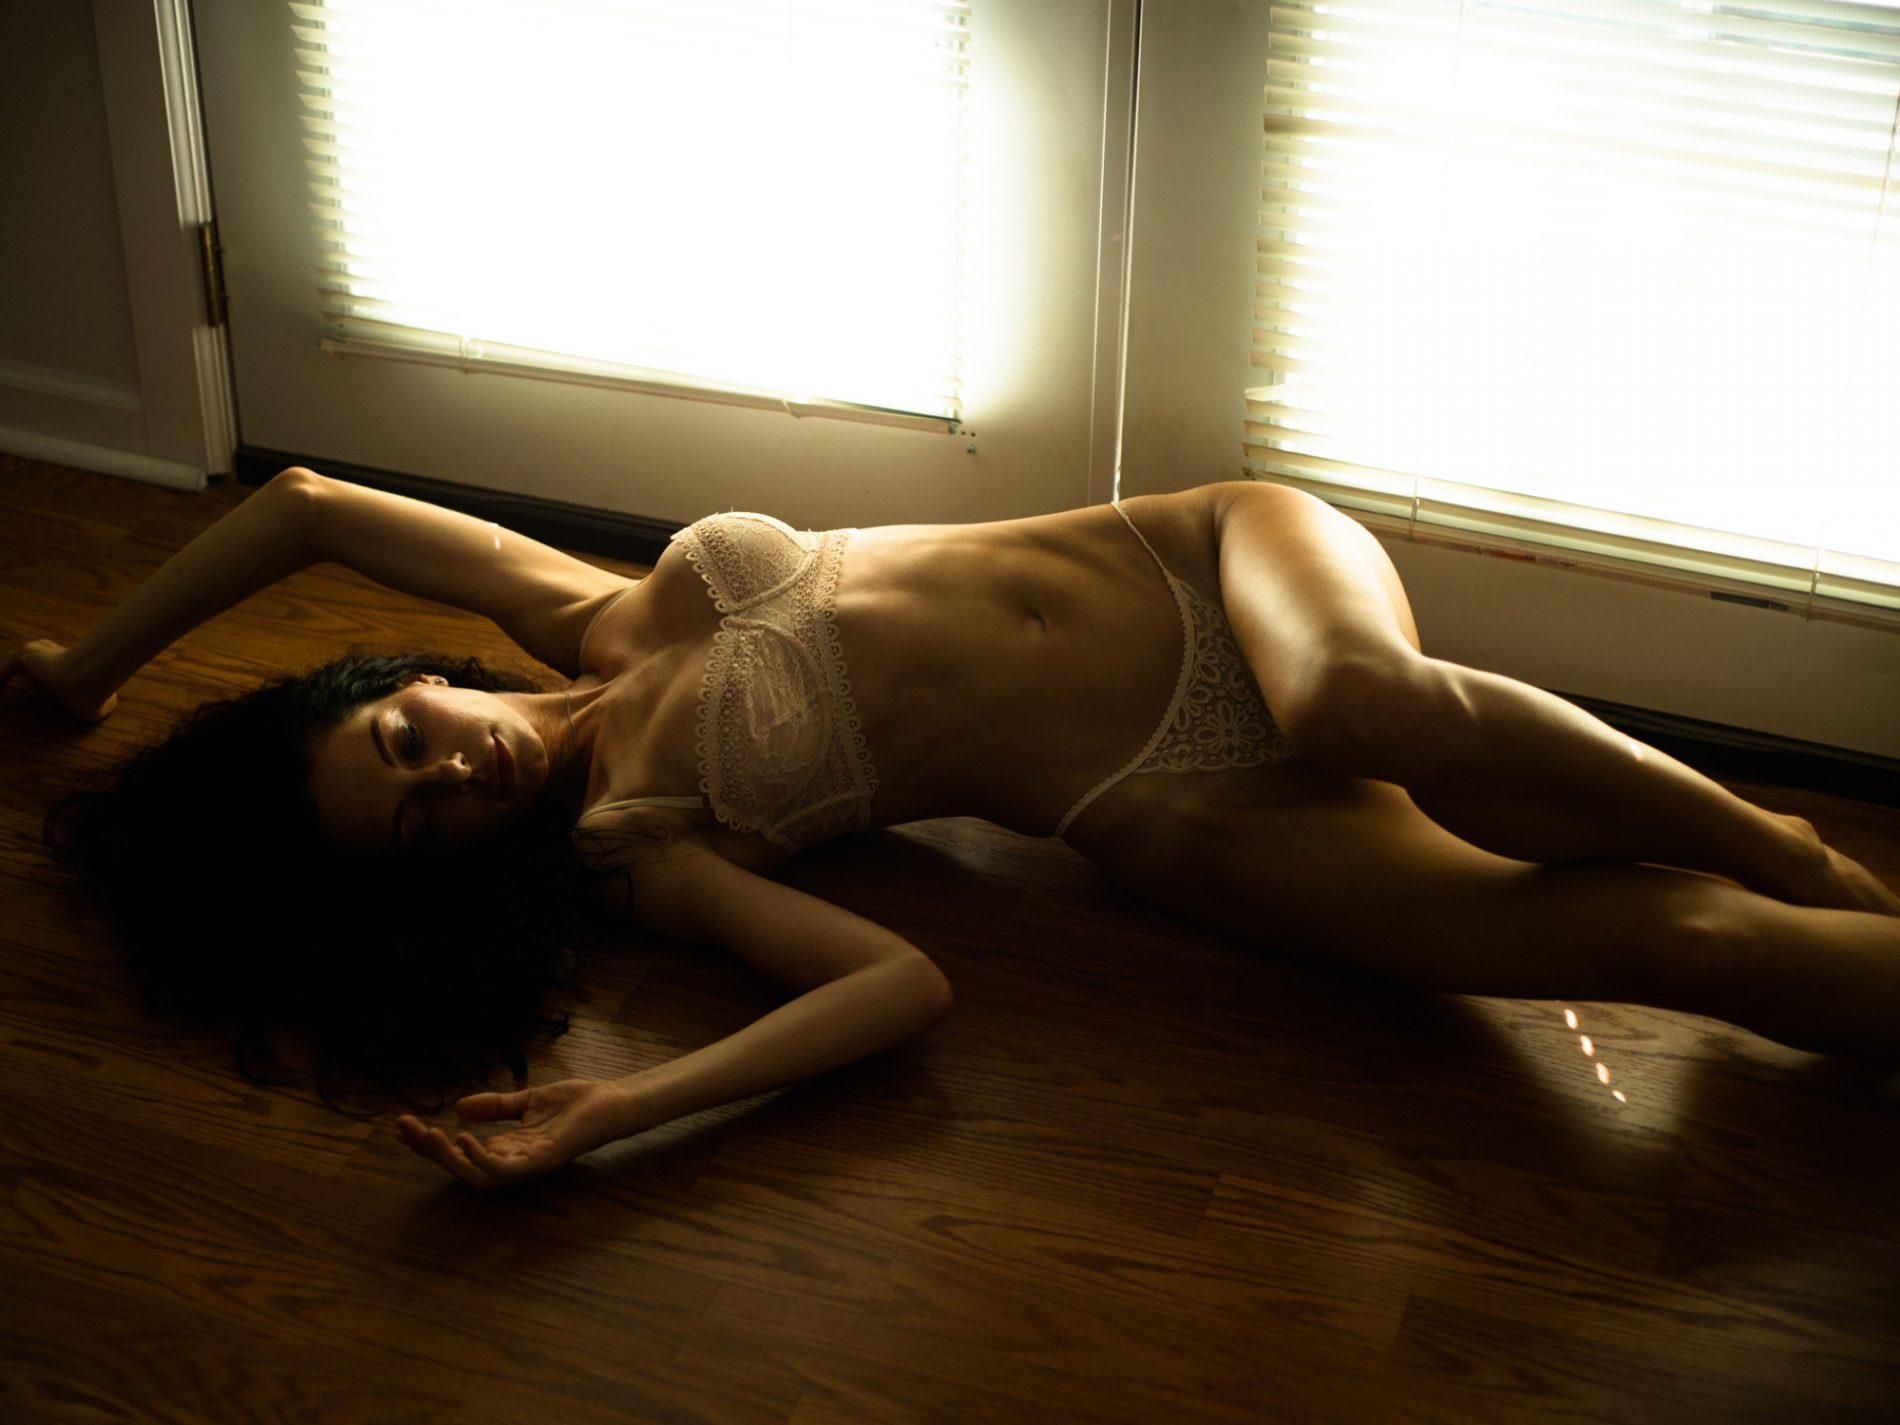 Daydream Believer Women    // lionsmag.com - premium nude photography magazine